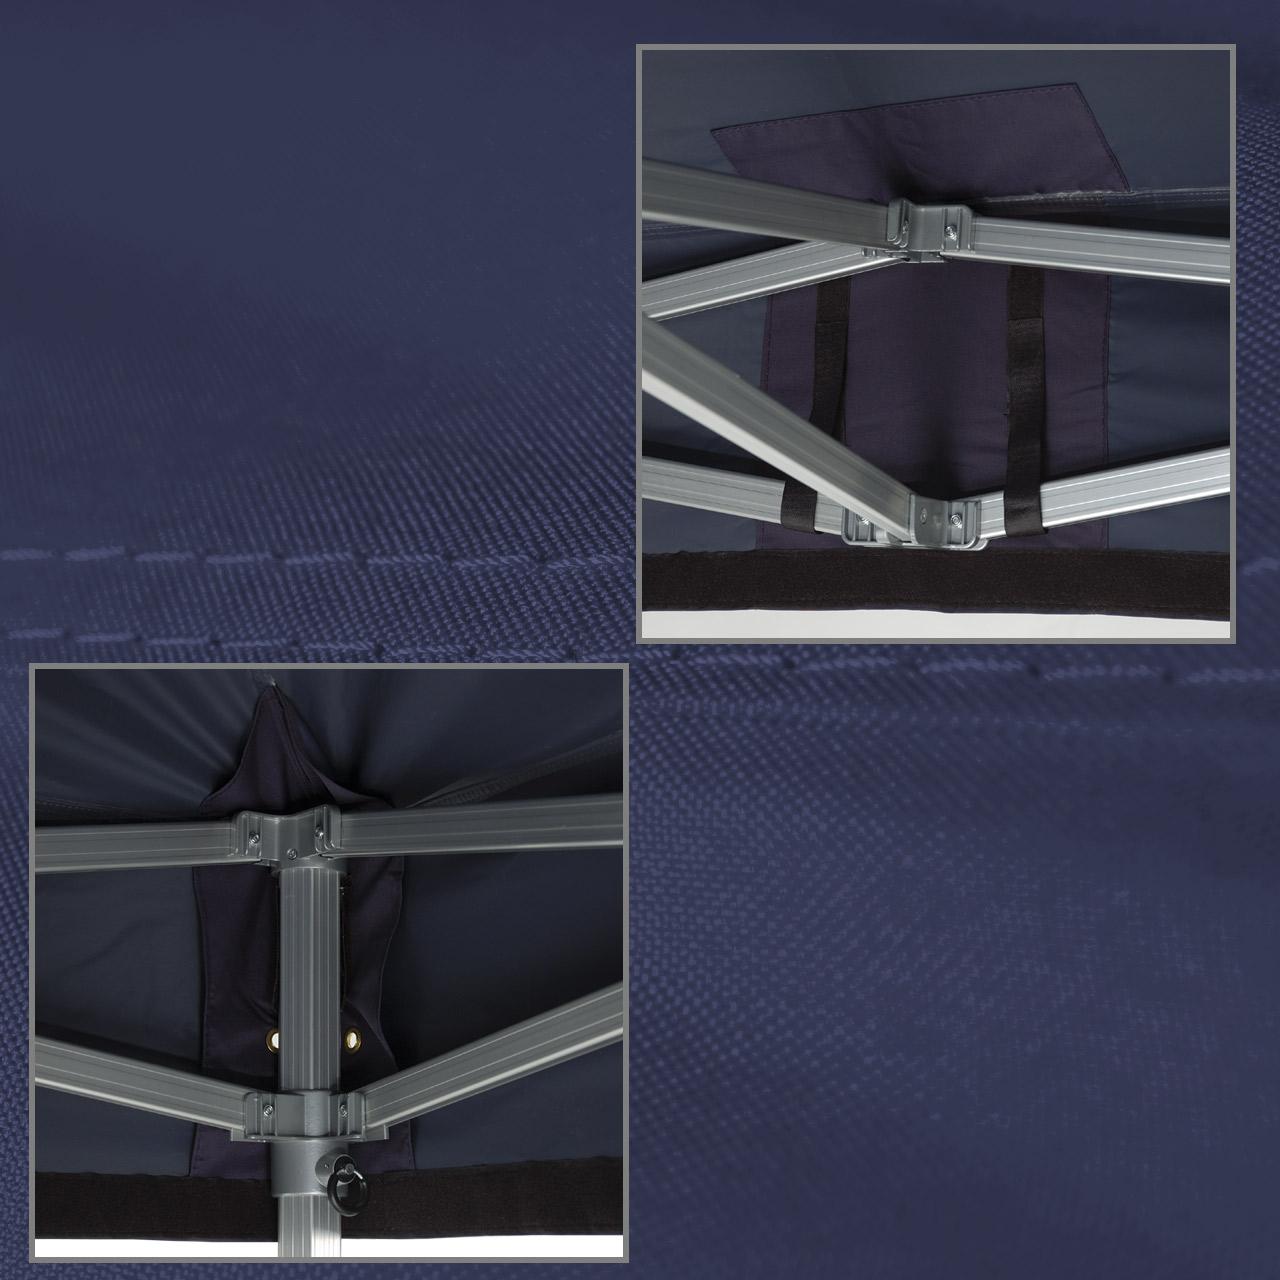 Faltpavillon-3x3-blau-Plane58b4209e8f9f4